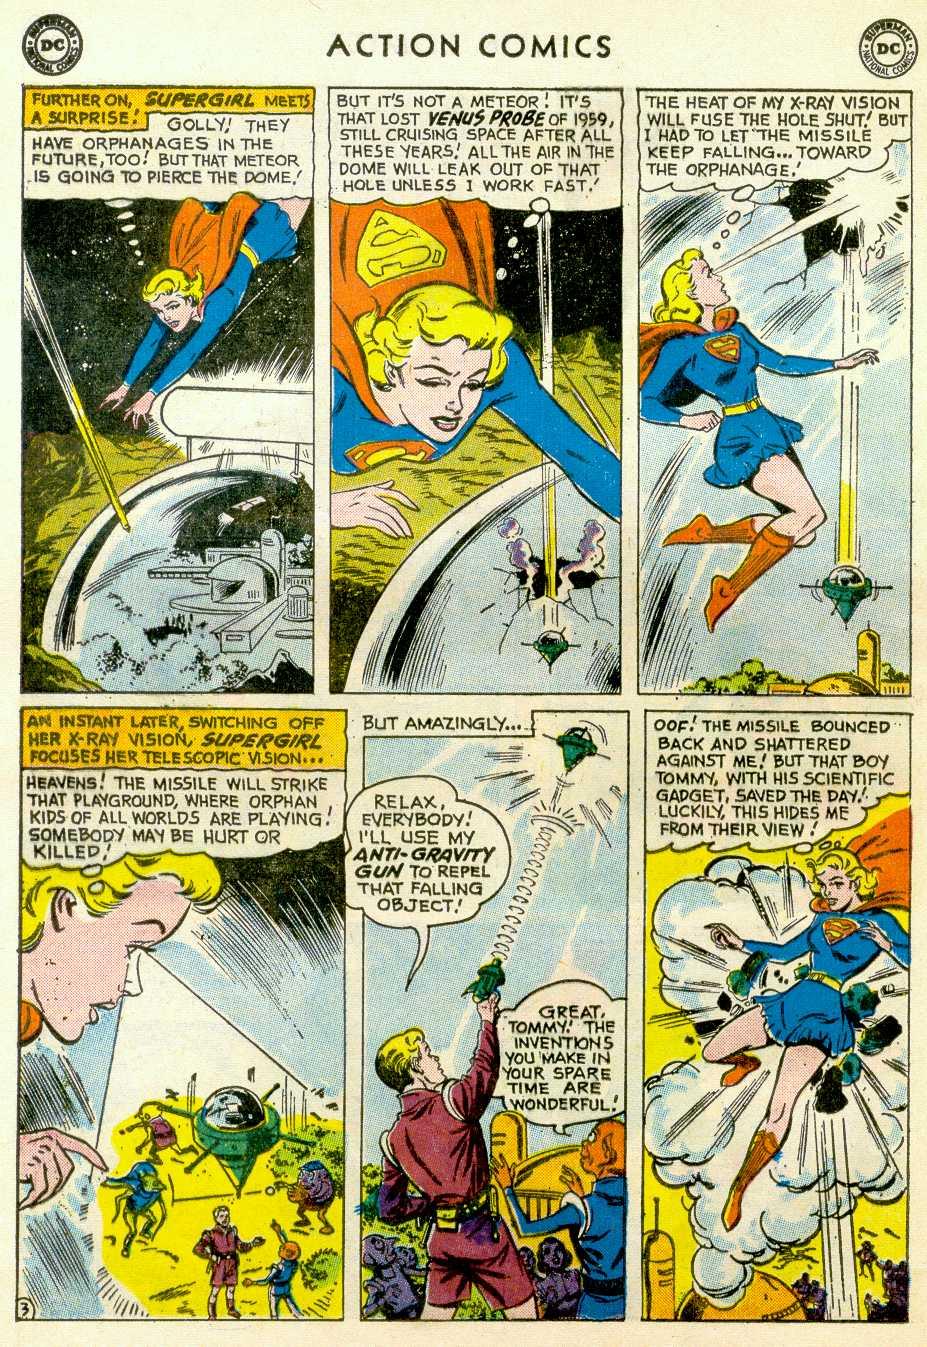 Action Comics (1938) 255 Page 27